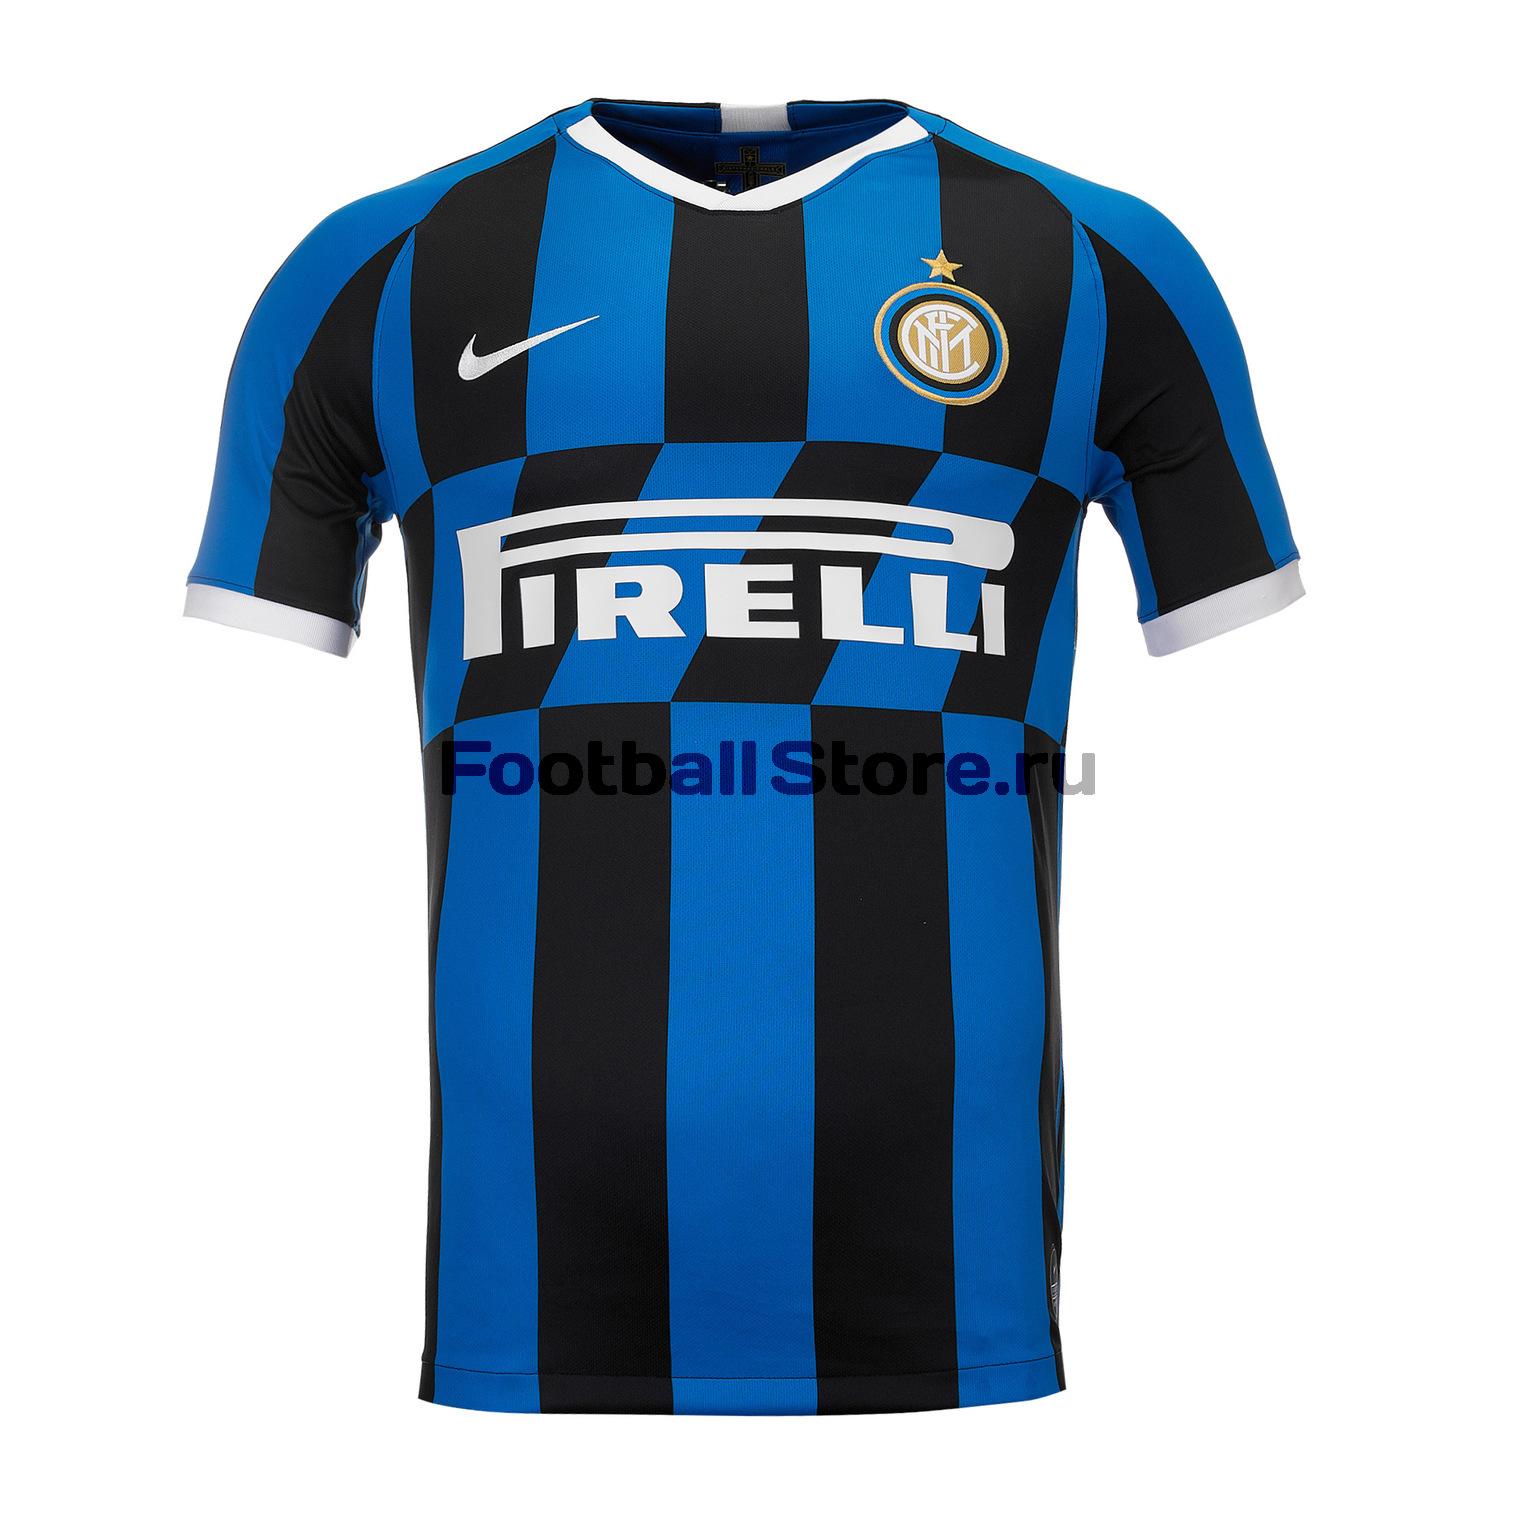 цена Футболка домашняя Nike Inter 2019/20 онлайн в 2017 году